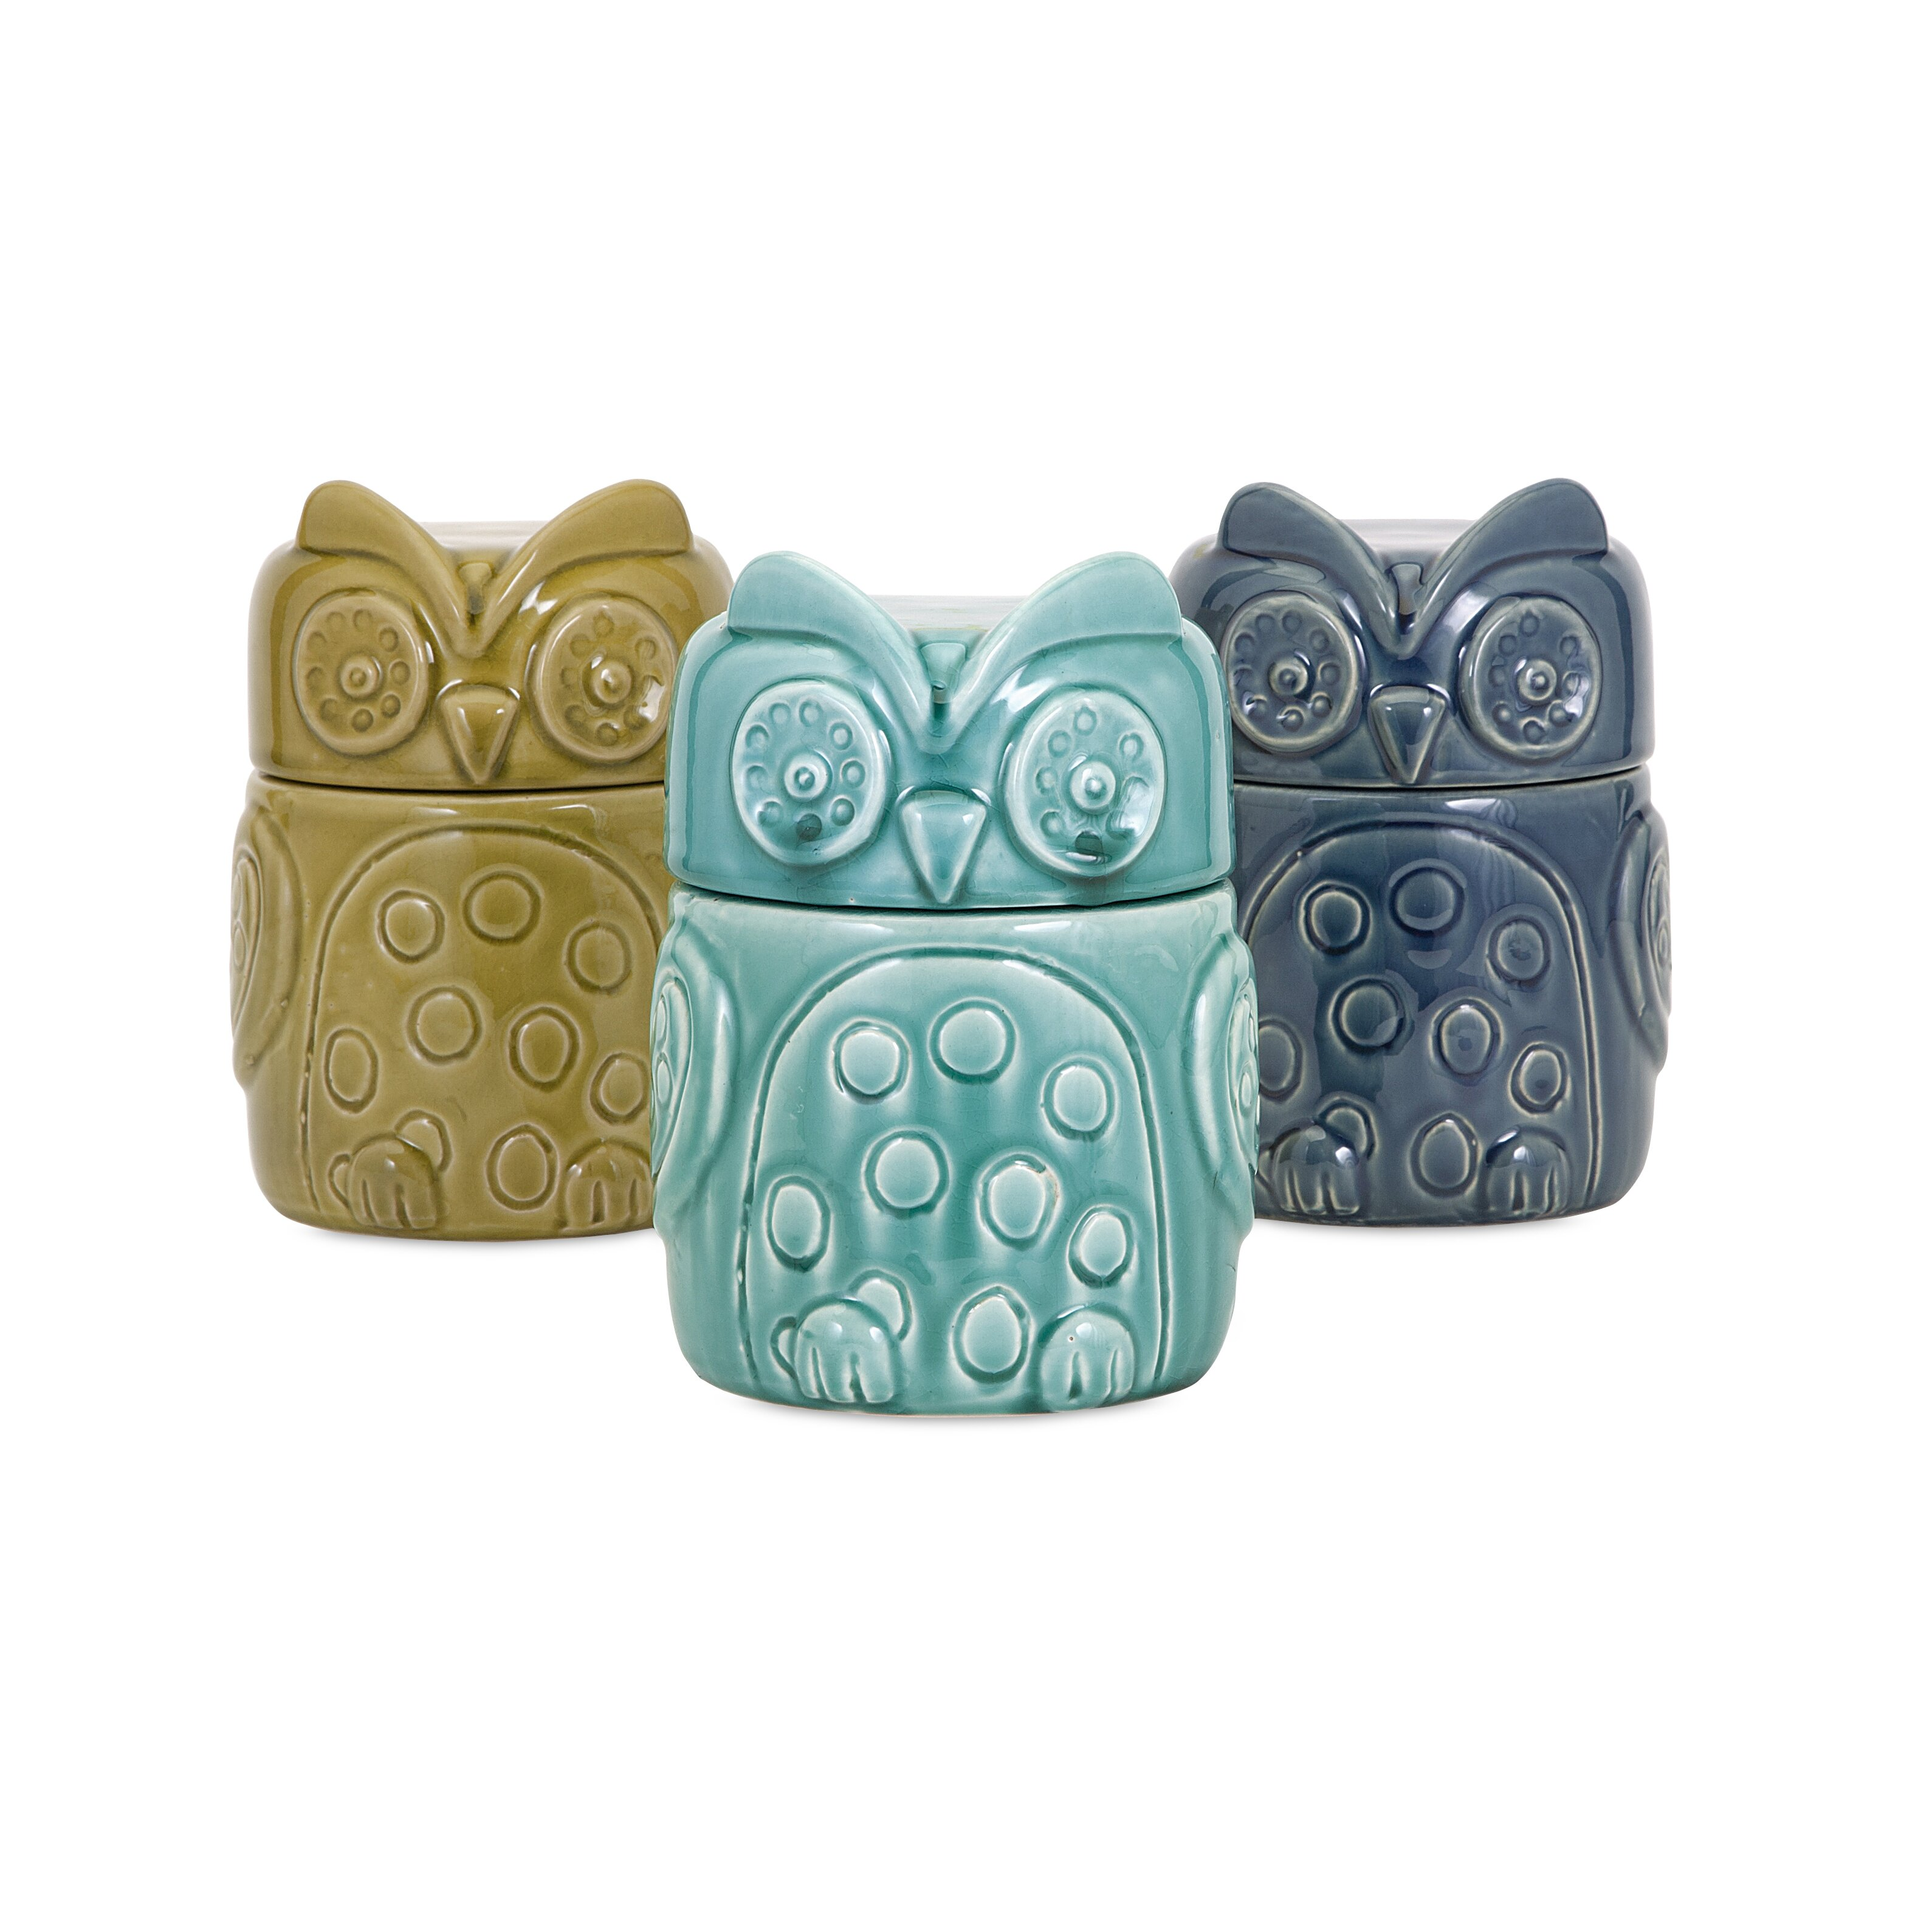 Owl Kitchen Decor Walmart: Latitude Run Owl Canister & Reviews